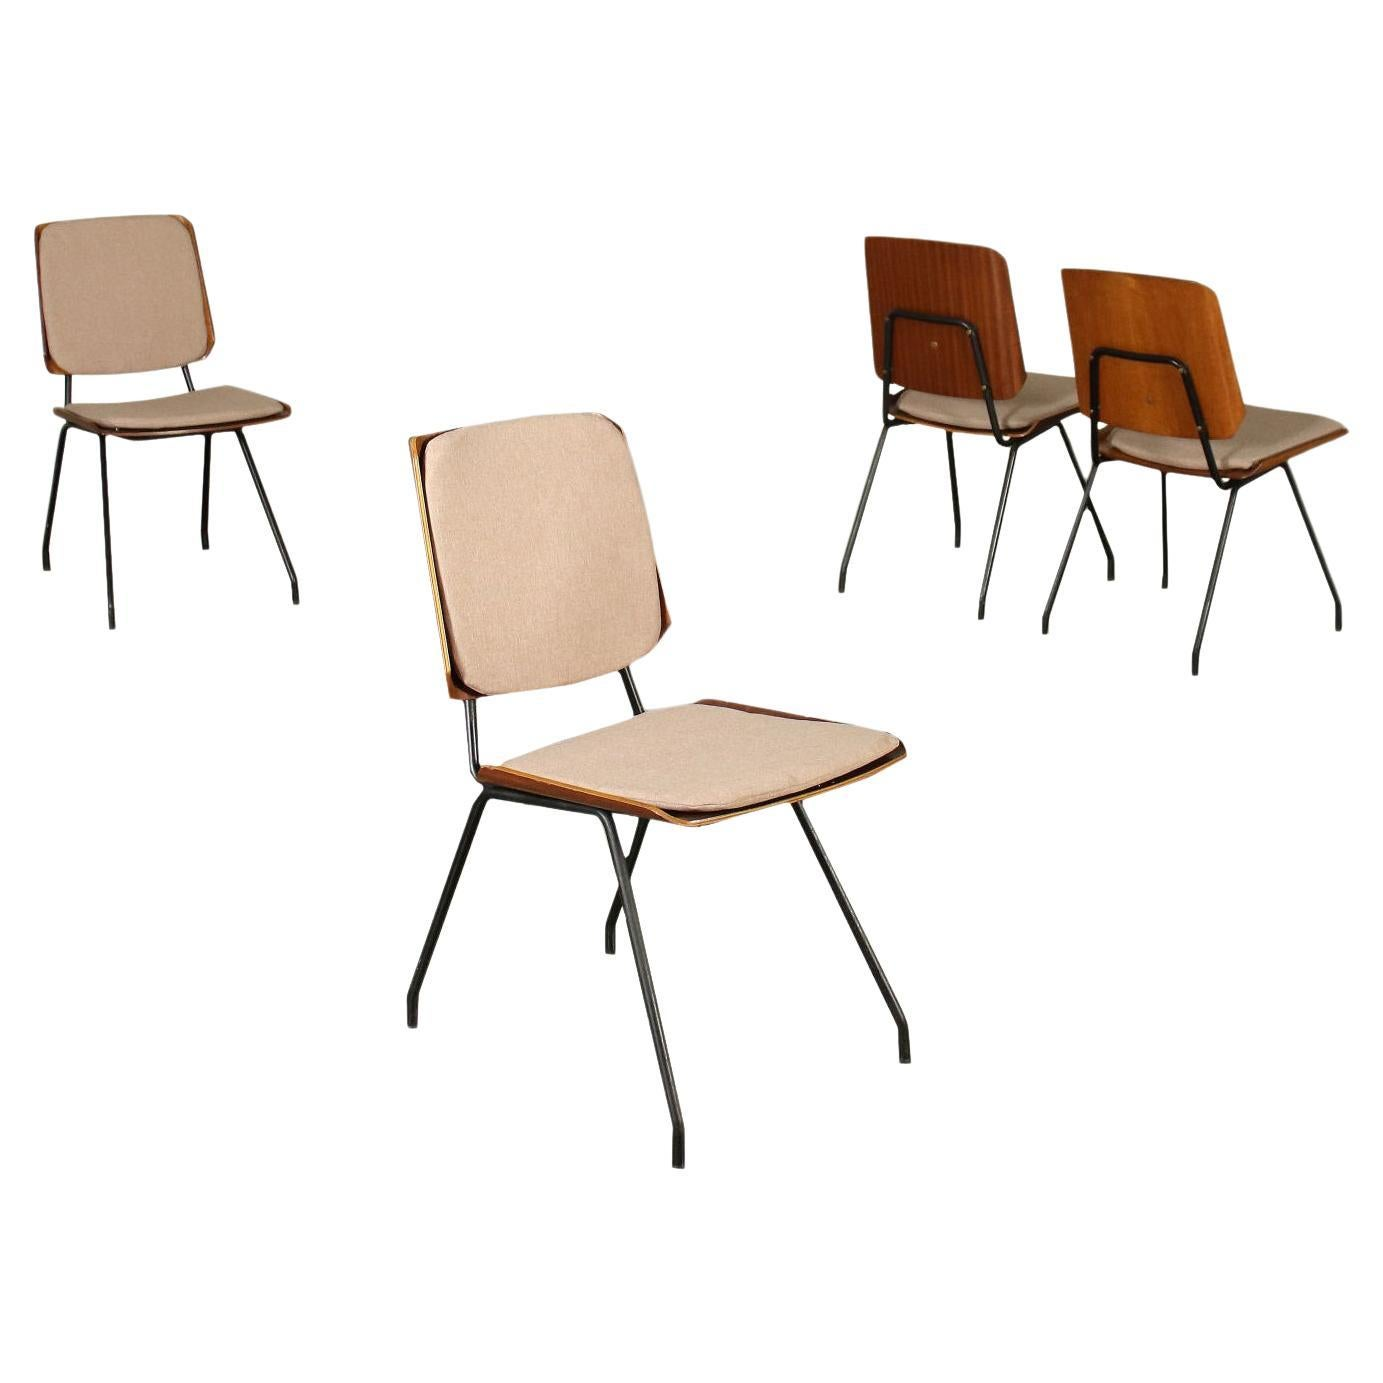 Group of Four Chairs Osvaldo Borsani Tecno Plywood Italy 1950s 1960s